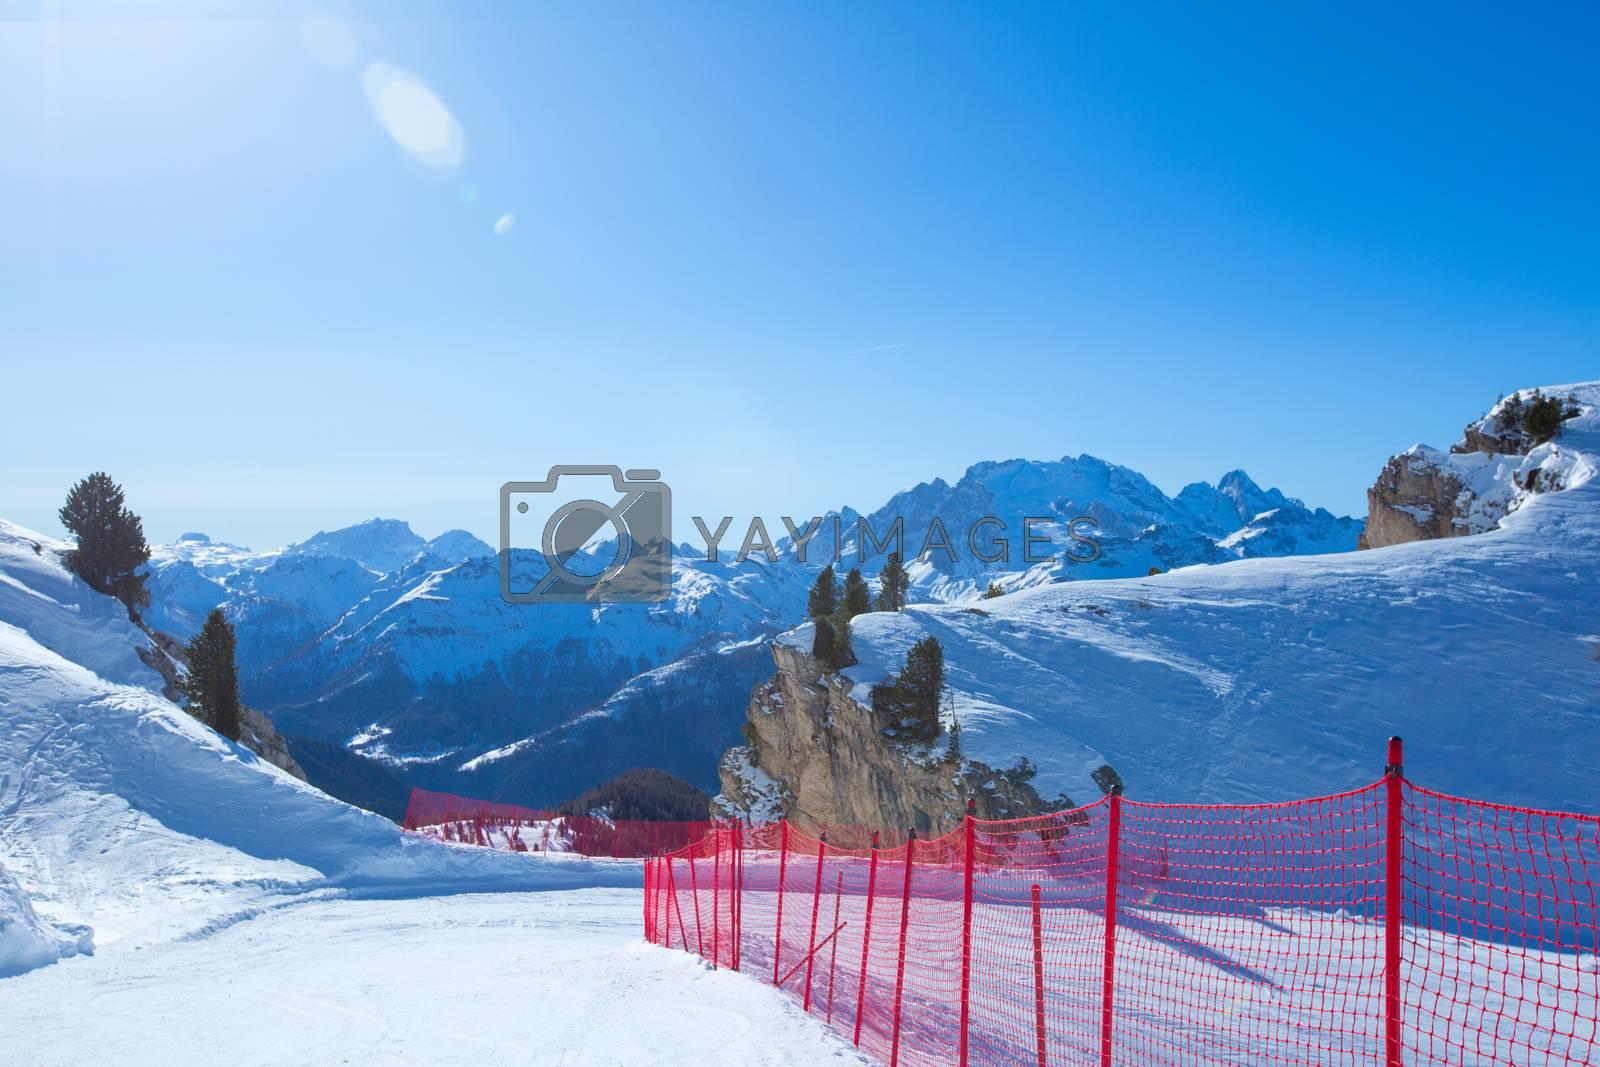 Dolomites Dolomiti Italy in wintertime beautiful alps winter mountains and ski slope Cortina d'Ampezzo Col Gallina mountain peaks famous landscape skiing resort area